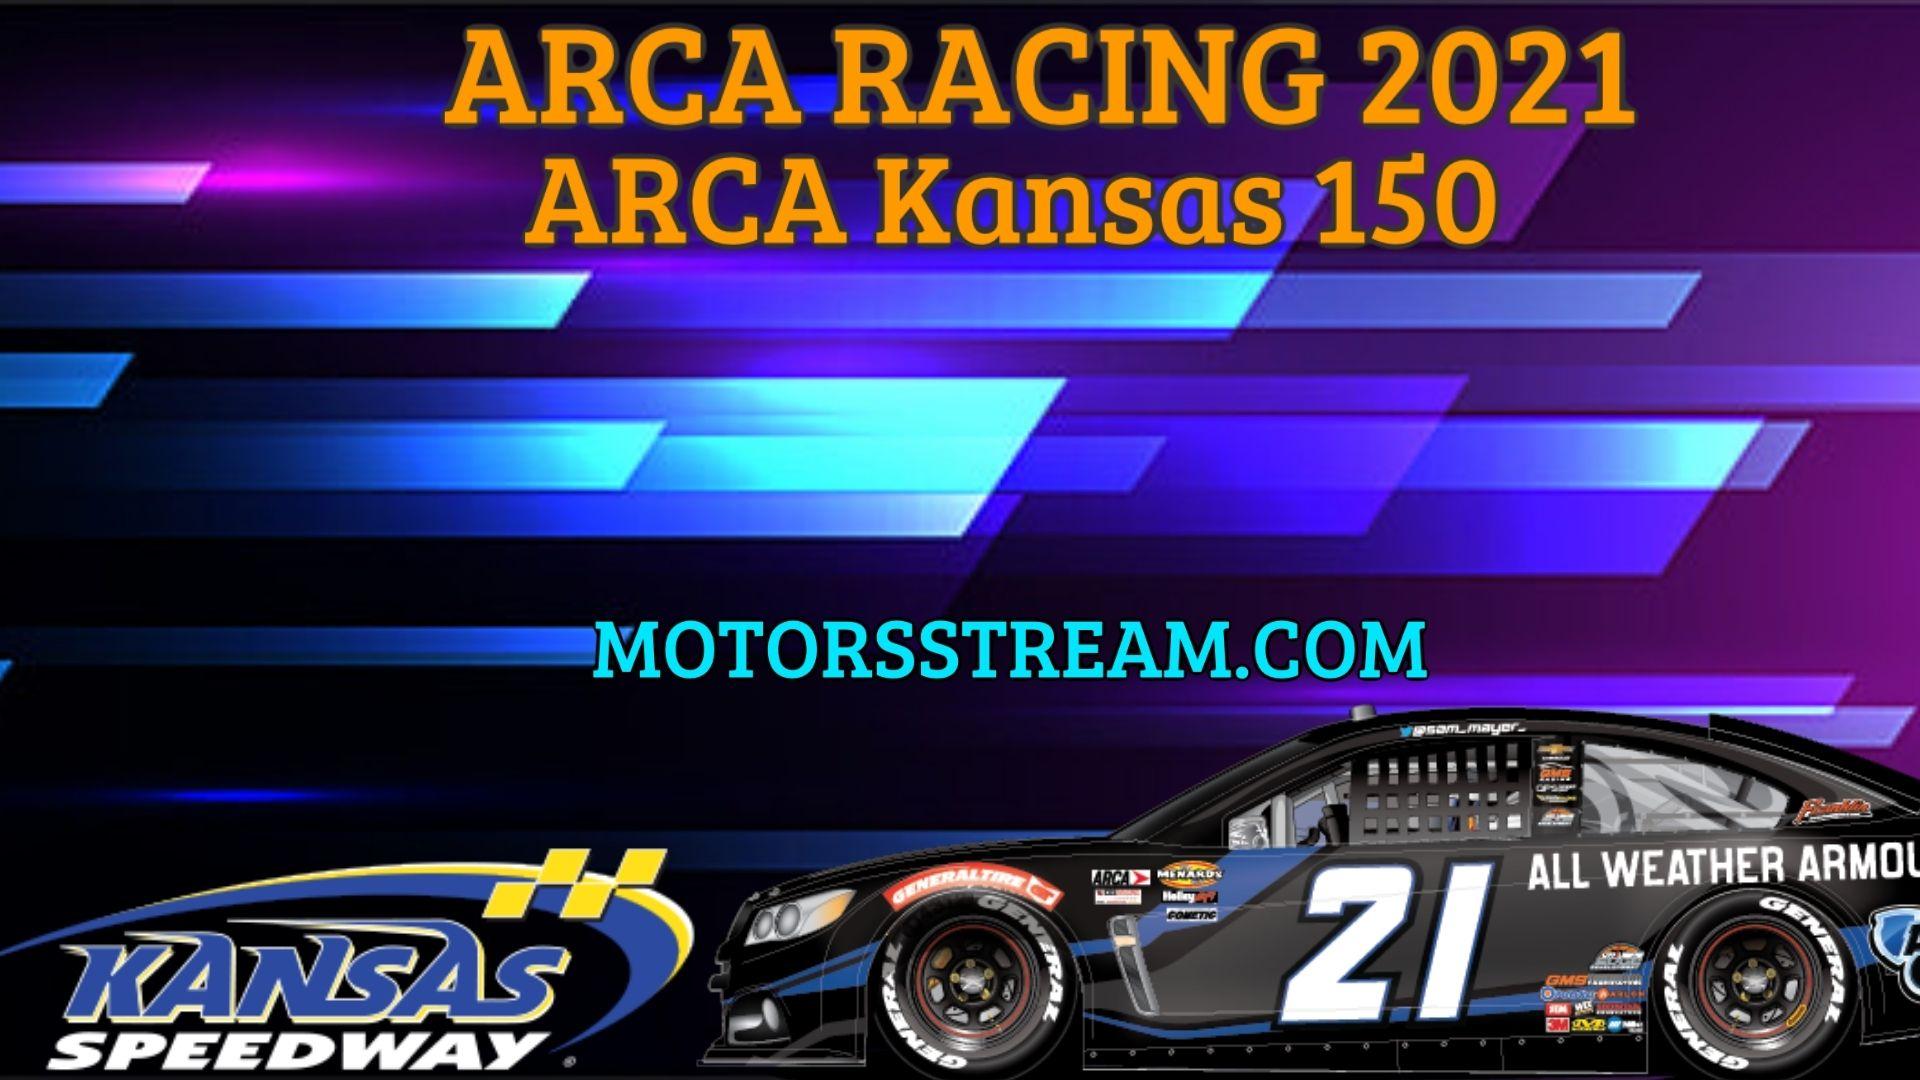 ARCA Kansas 150 Live Stream 2021 Arca Racing